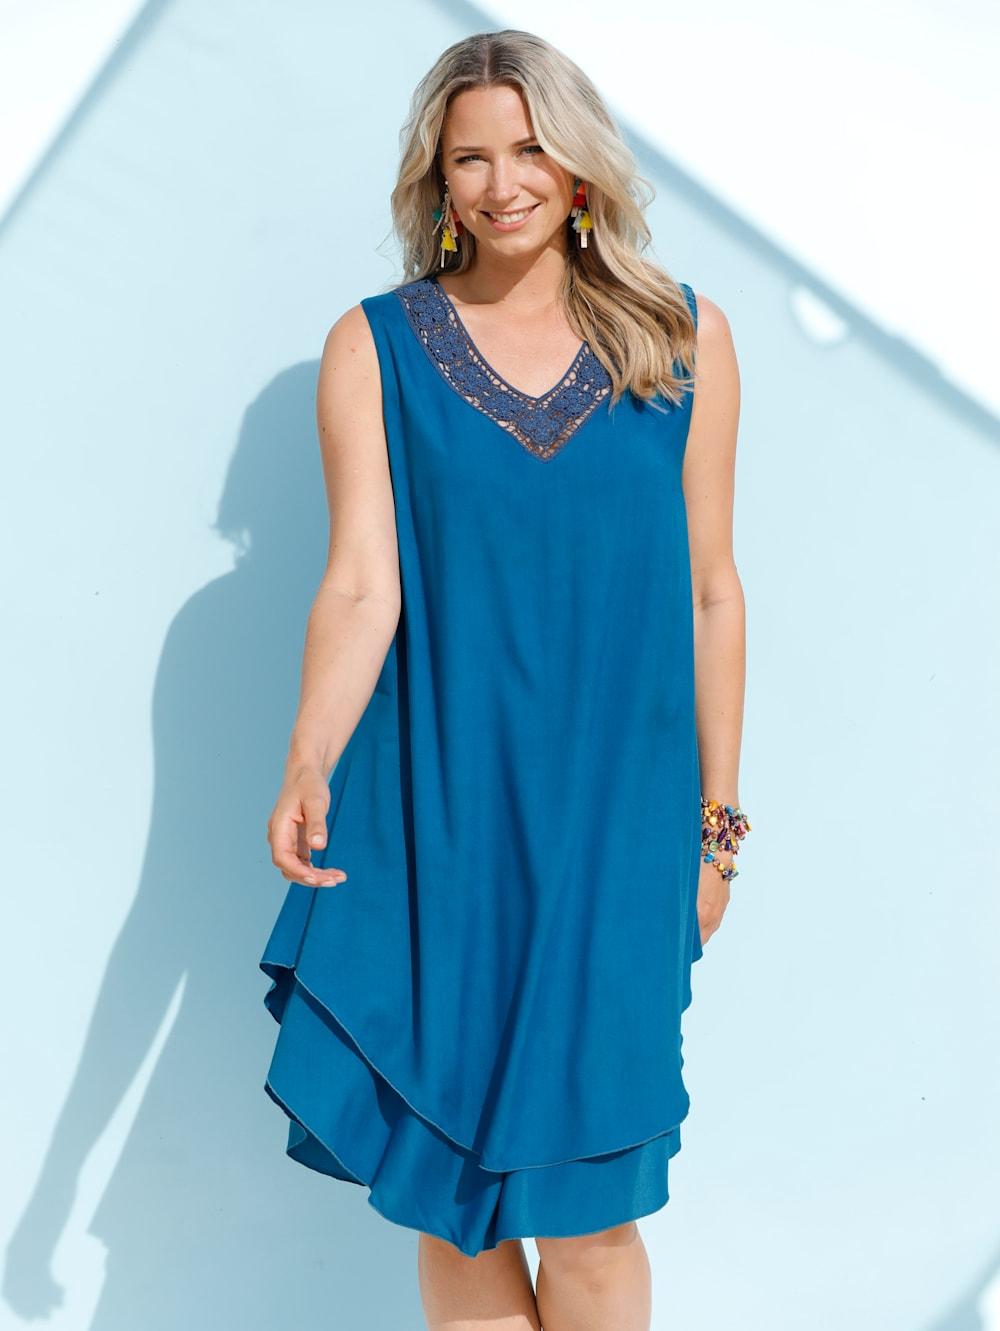 MIAMODA Kleid mit Abstufungen am Saum  Mia Moda